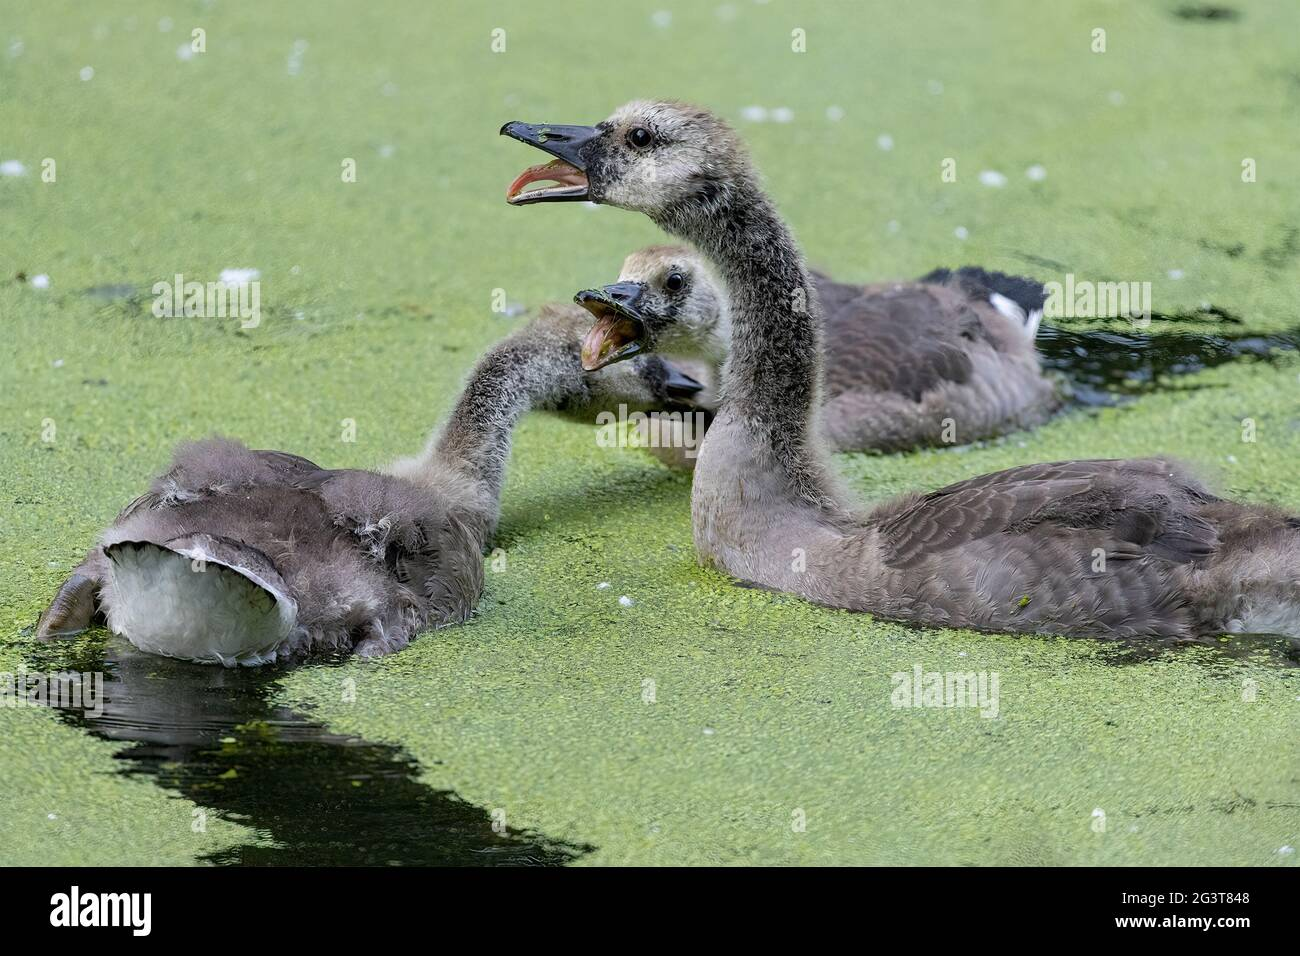 canada-geese-goslings-in-water-swimming-